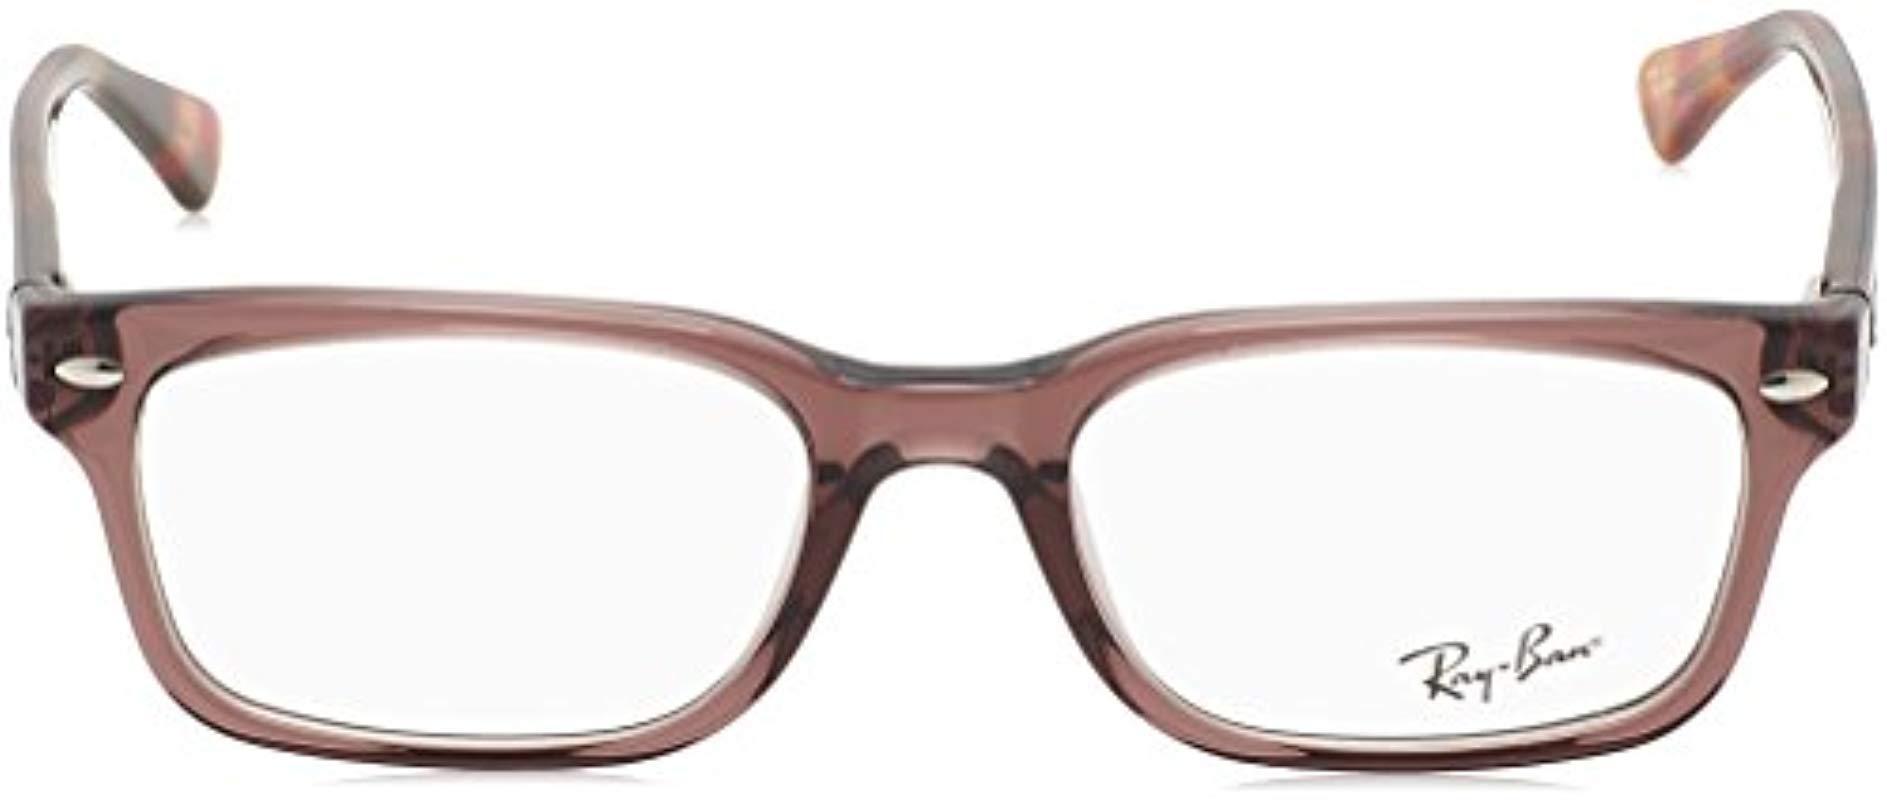 05e77c8e22888 Ray-Ban - Brown Rx5286 Eyeglasses - Lyst. View fullscreen